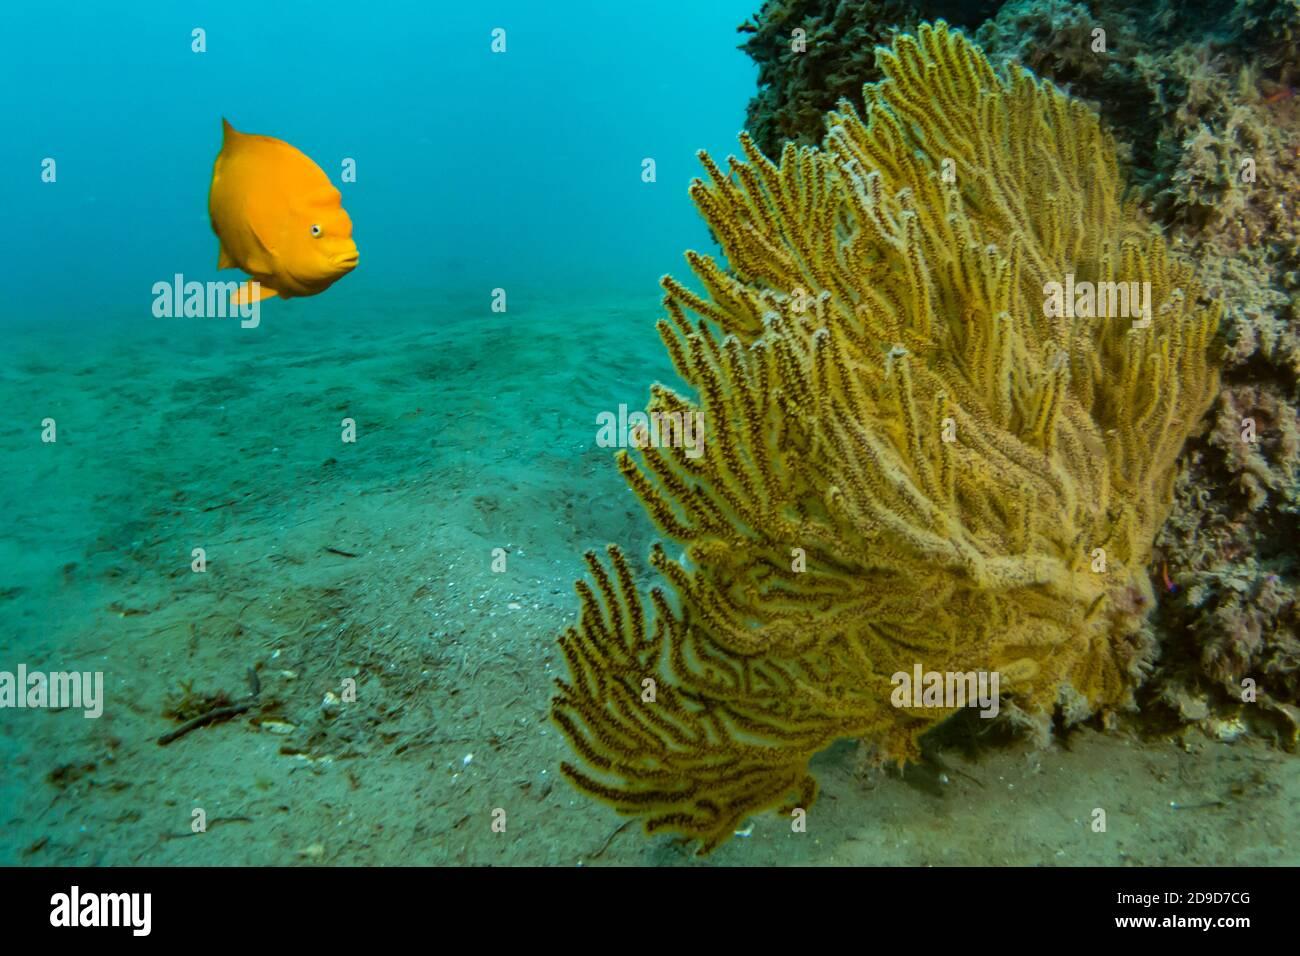 Garibaldi, Hypsypops rubicundus, the California State Marine Fish, SCUBA diving at Catalina Island, California, USA Stock Photo